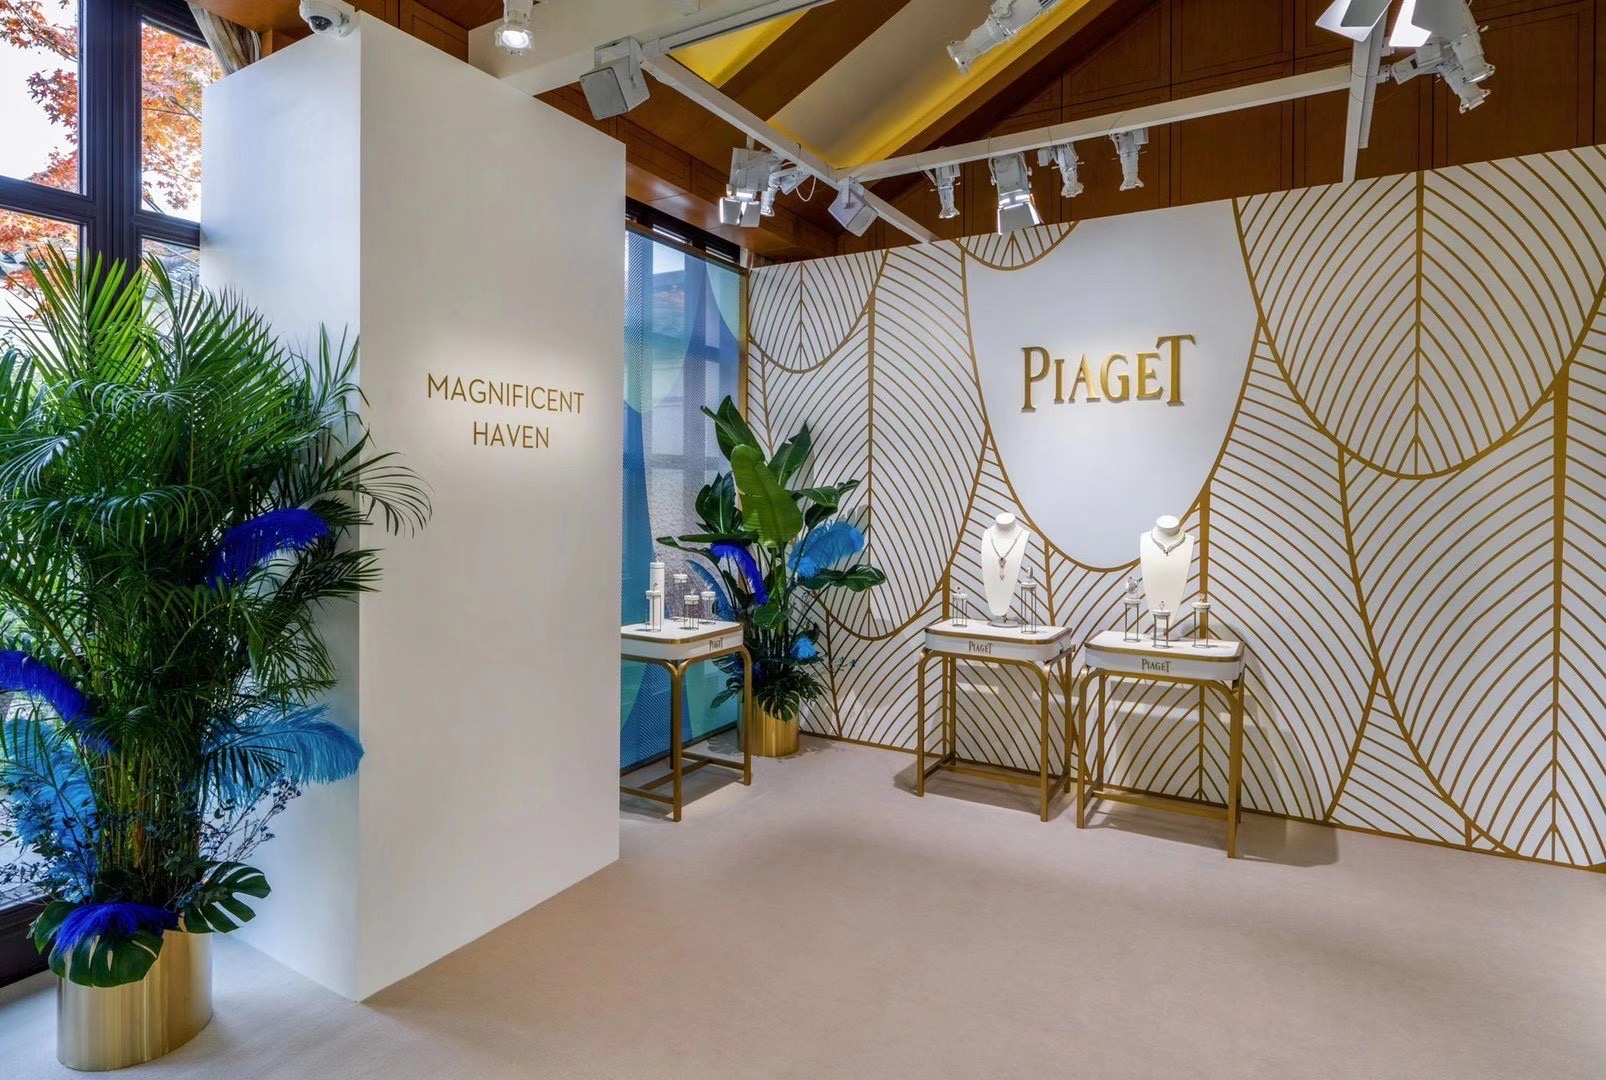 Piaget HJ Exhibition & Gala Dinner December 10th-12th Hanghzou – 5